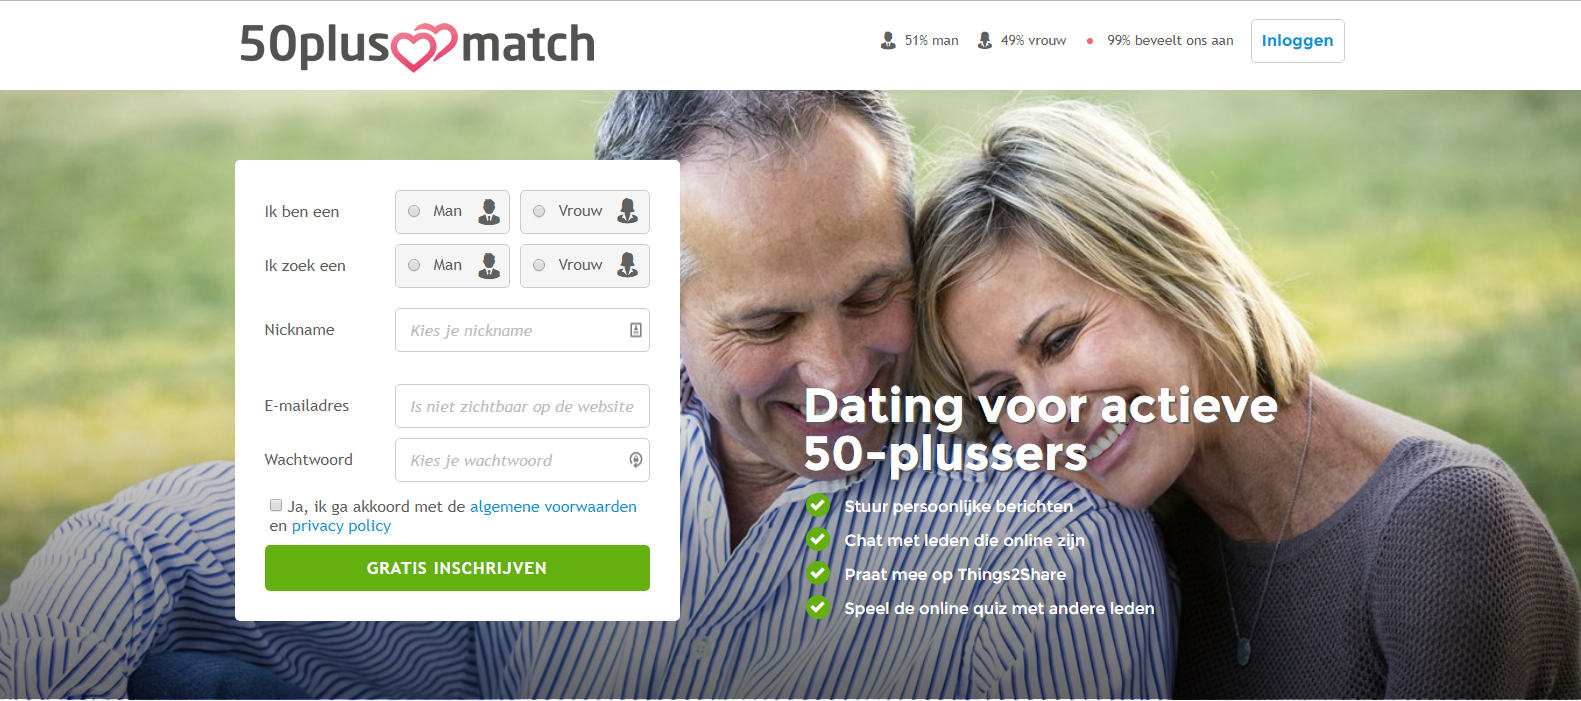 beste vriend dating website Prank Call dating service